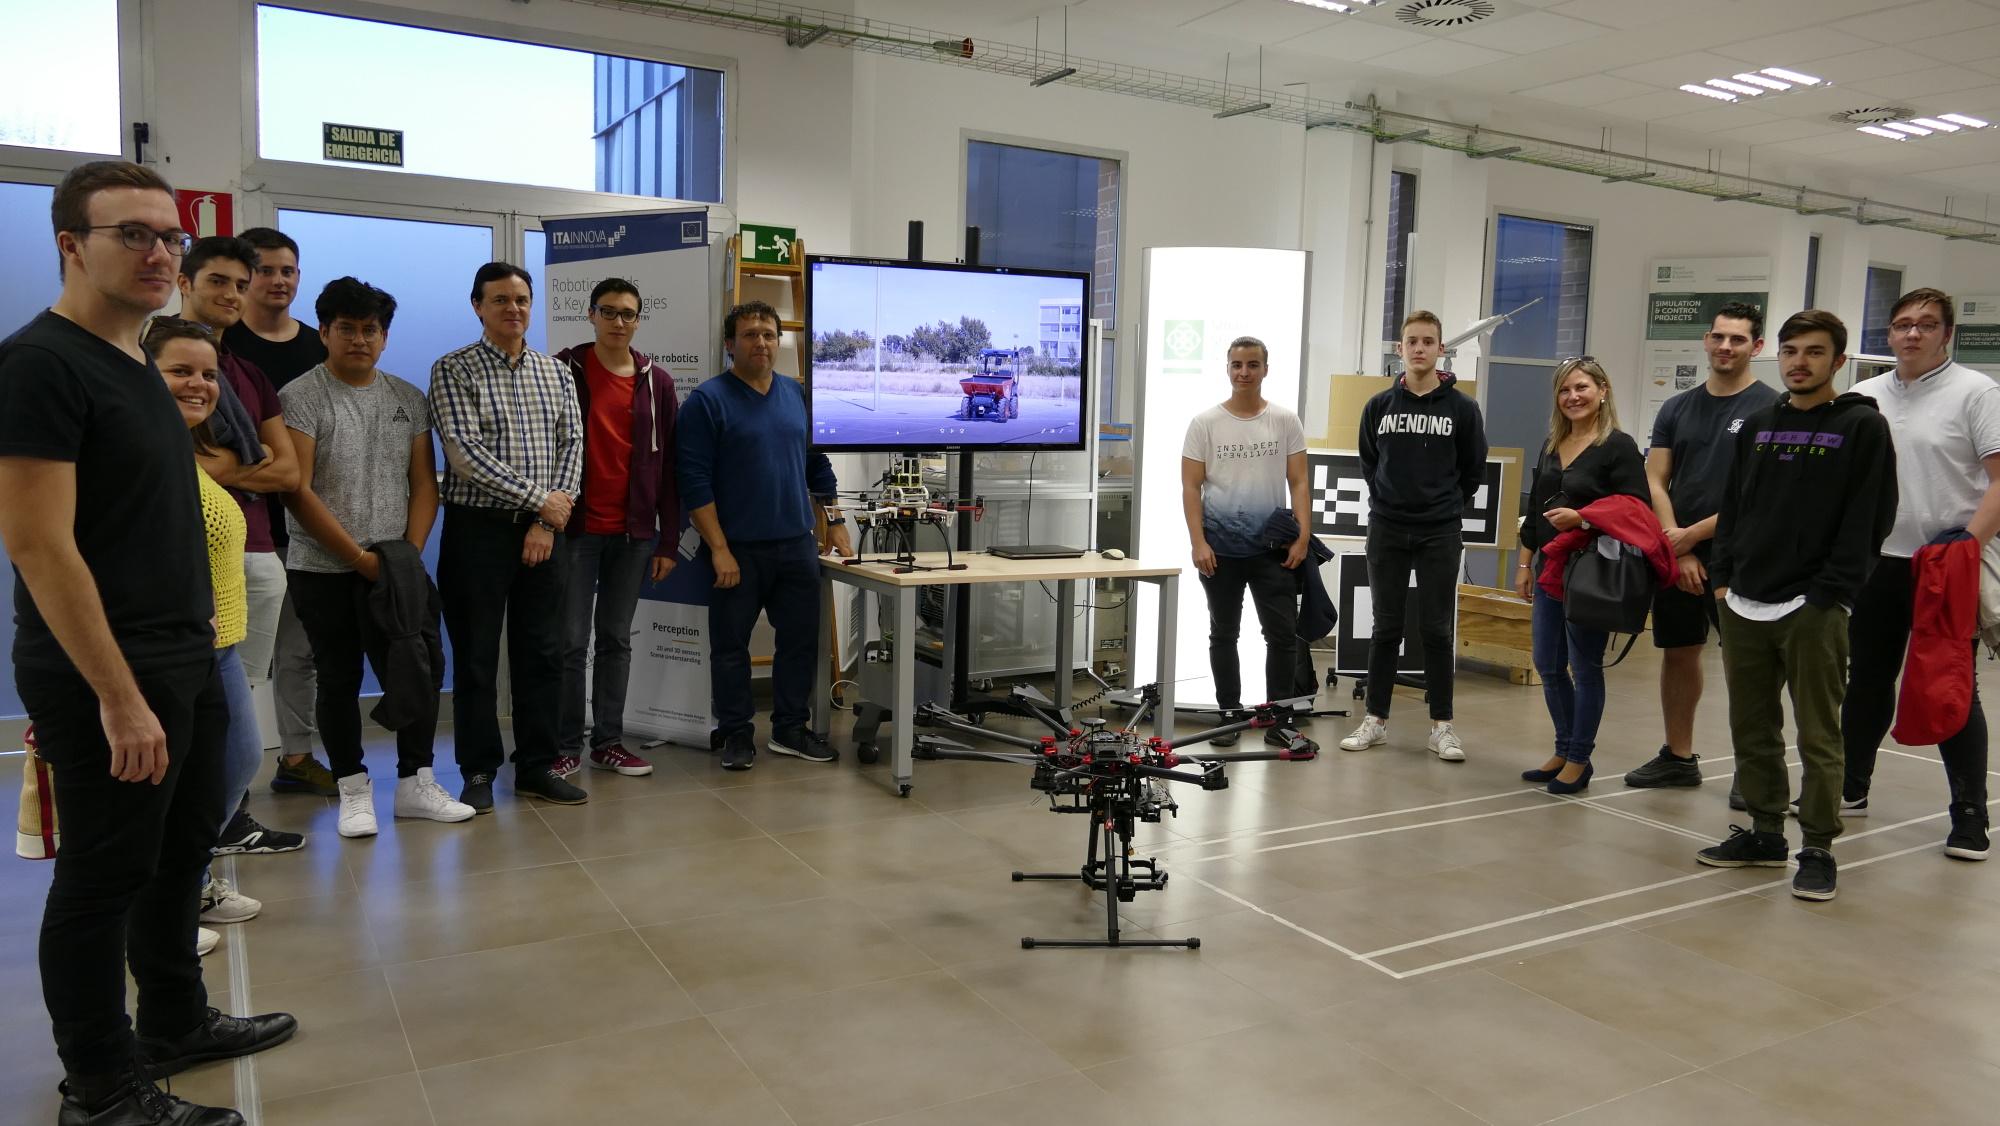 Salesianos de Zaragoza propone un Bootcamp tecnológico con ITAINNOVA